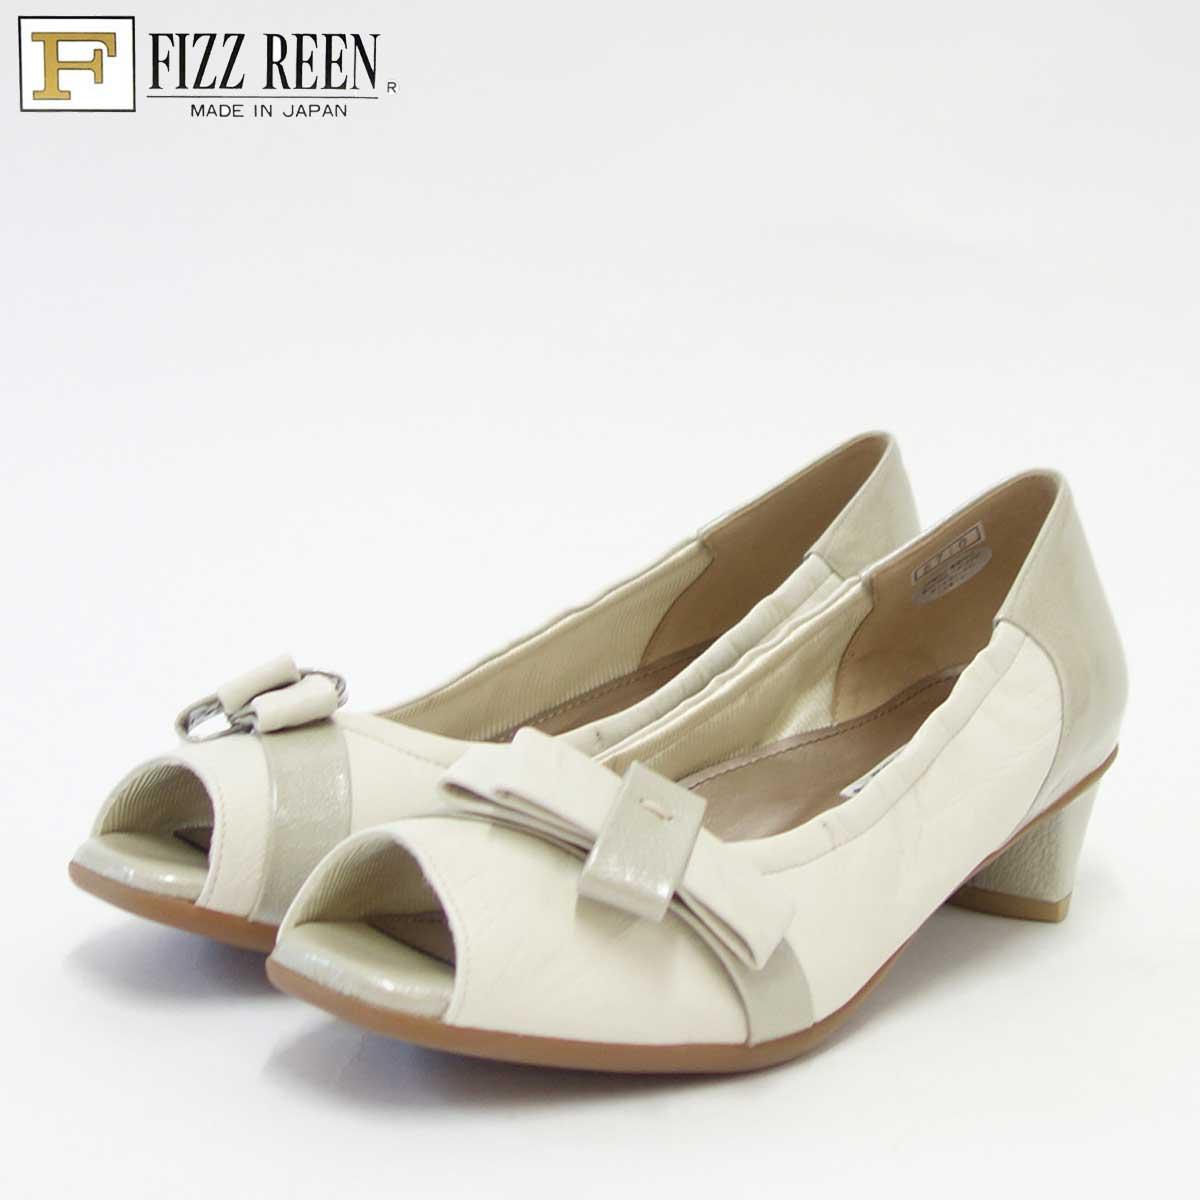 FIZZ REEN フィズリーン 8710 アイボリー(レディース)快適EEEのオープントゥパンプス(日本製)「靴」